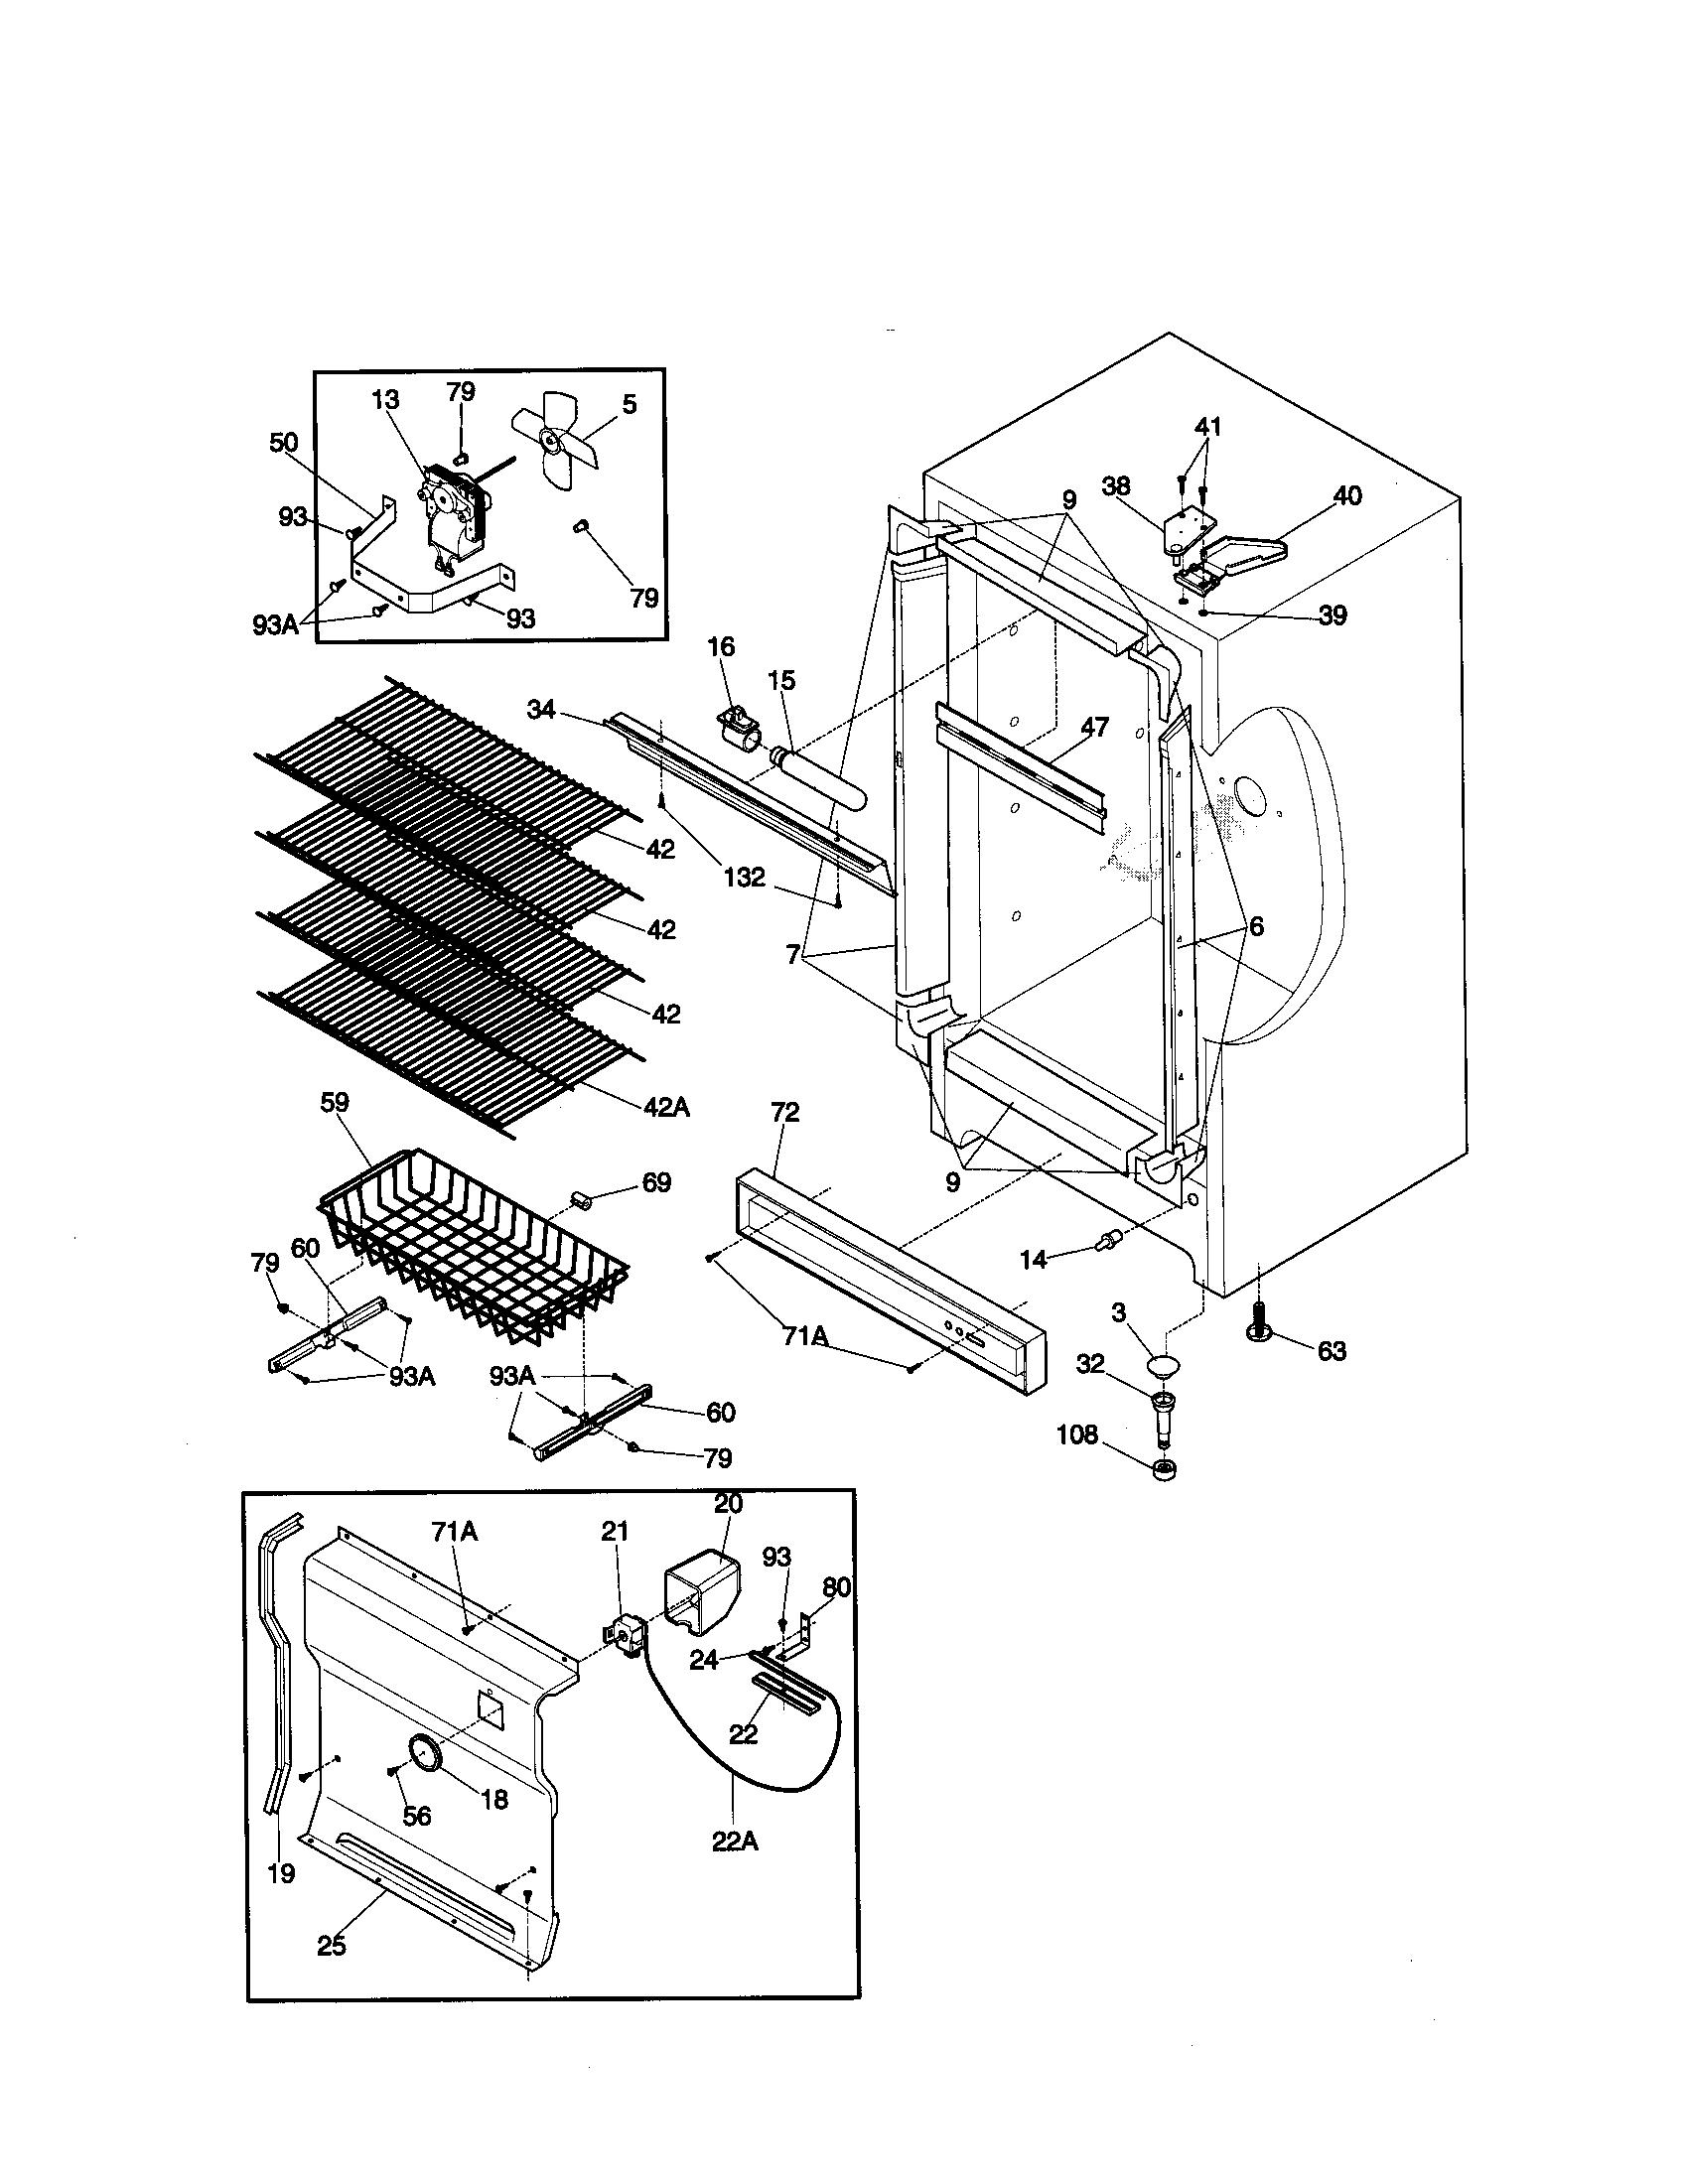 CABINET Diagram & Parts List for Model 2539287413 Kenmore